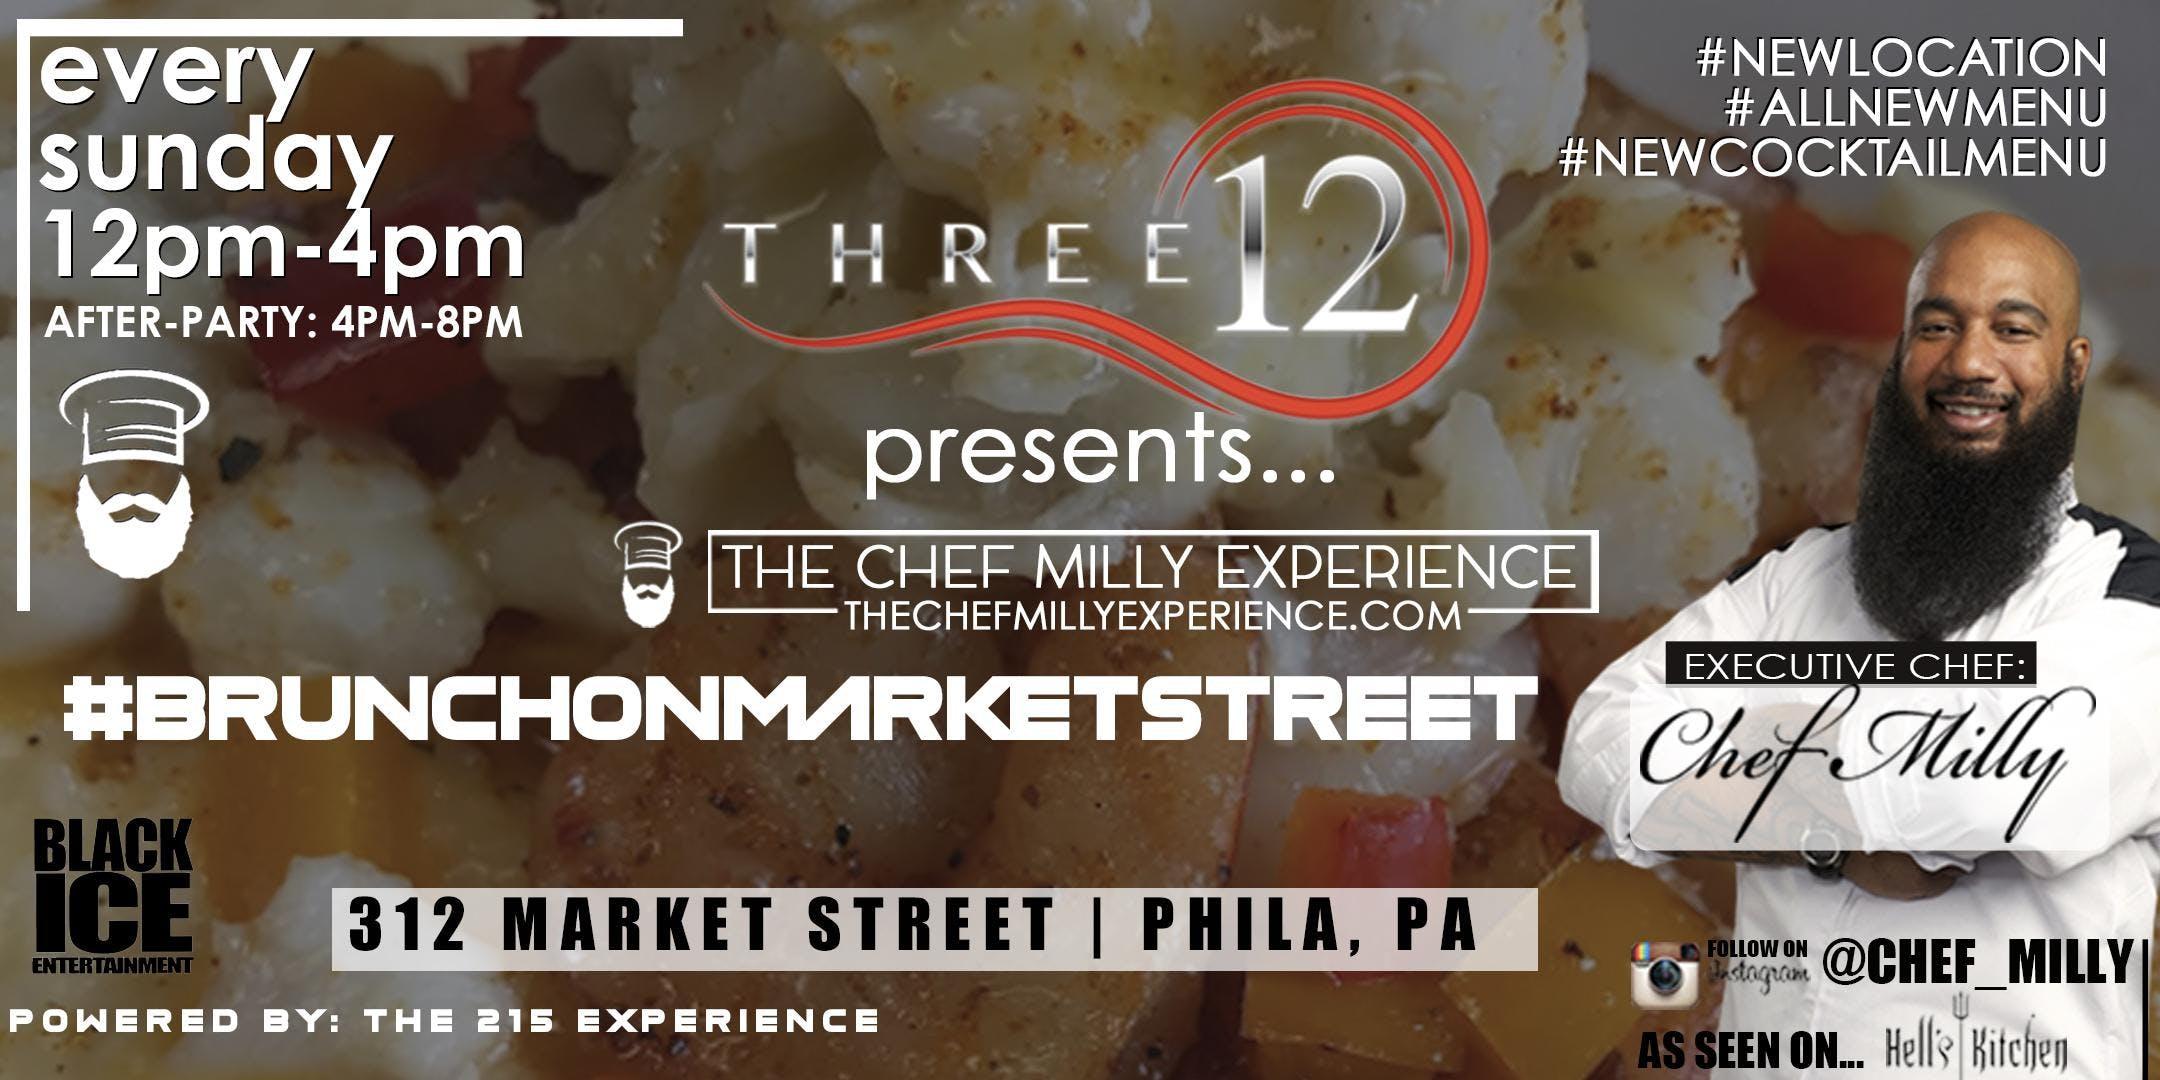 312 SPORTSLOUNGE PRESENTS #THECHEFMILLYEXPERIENCE BRUNCH ON MARKET STREET